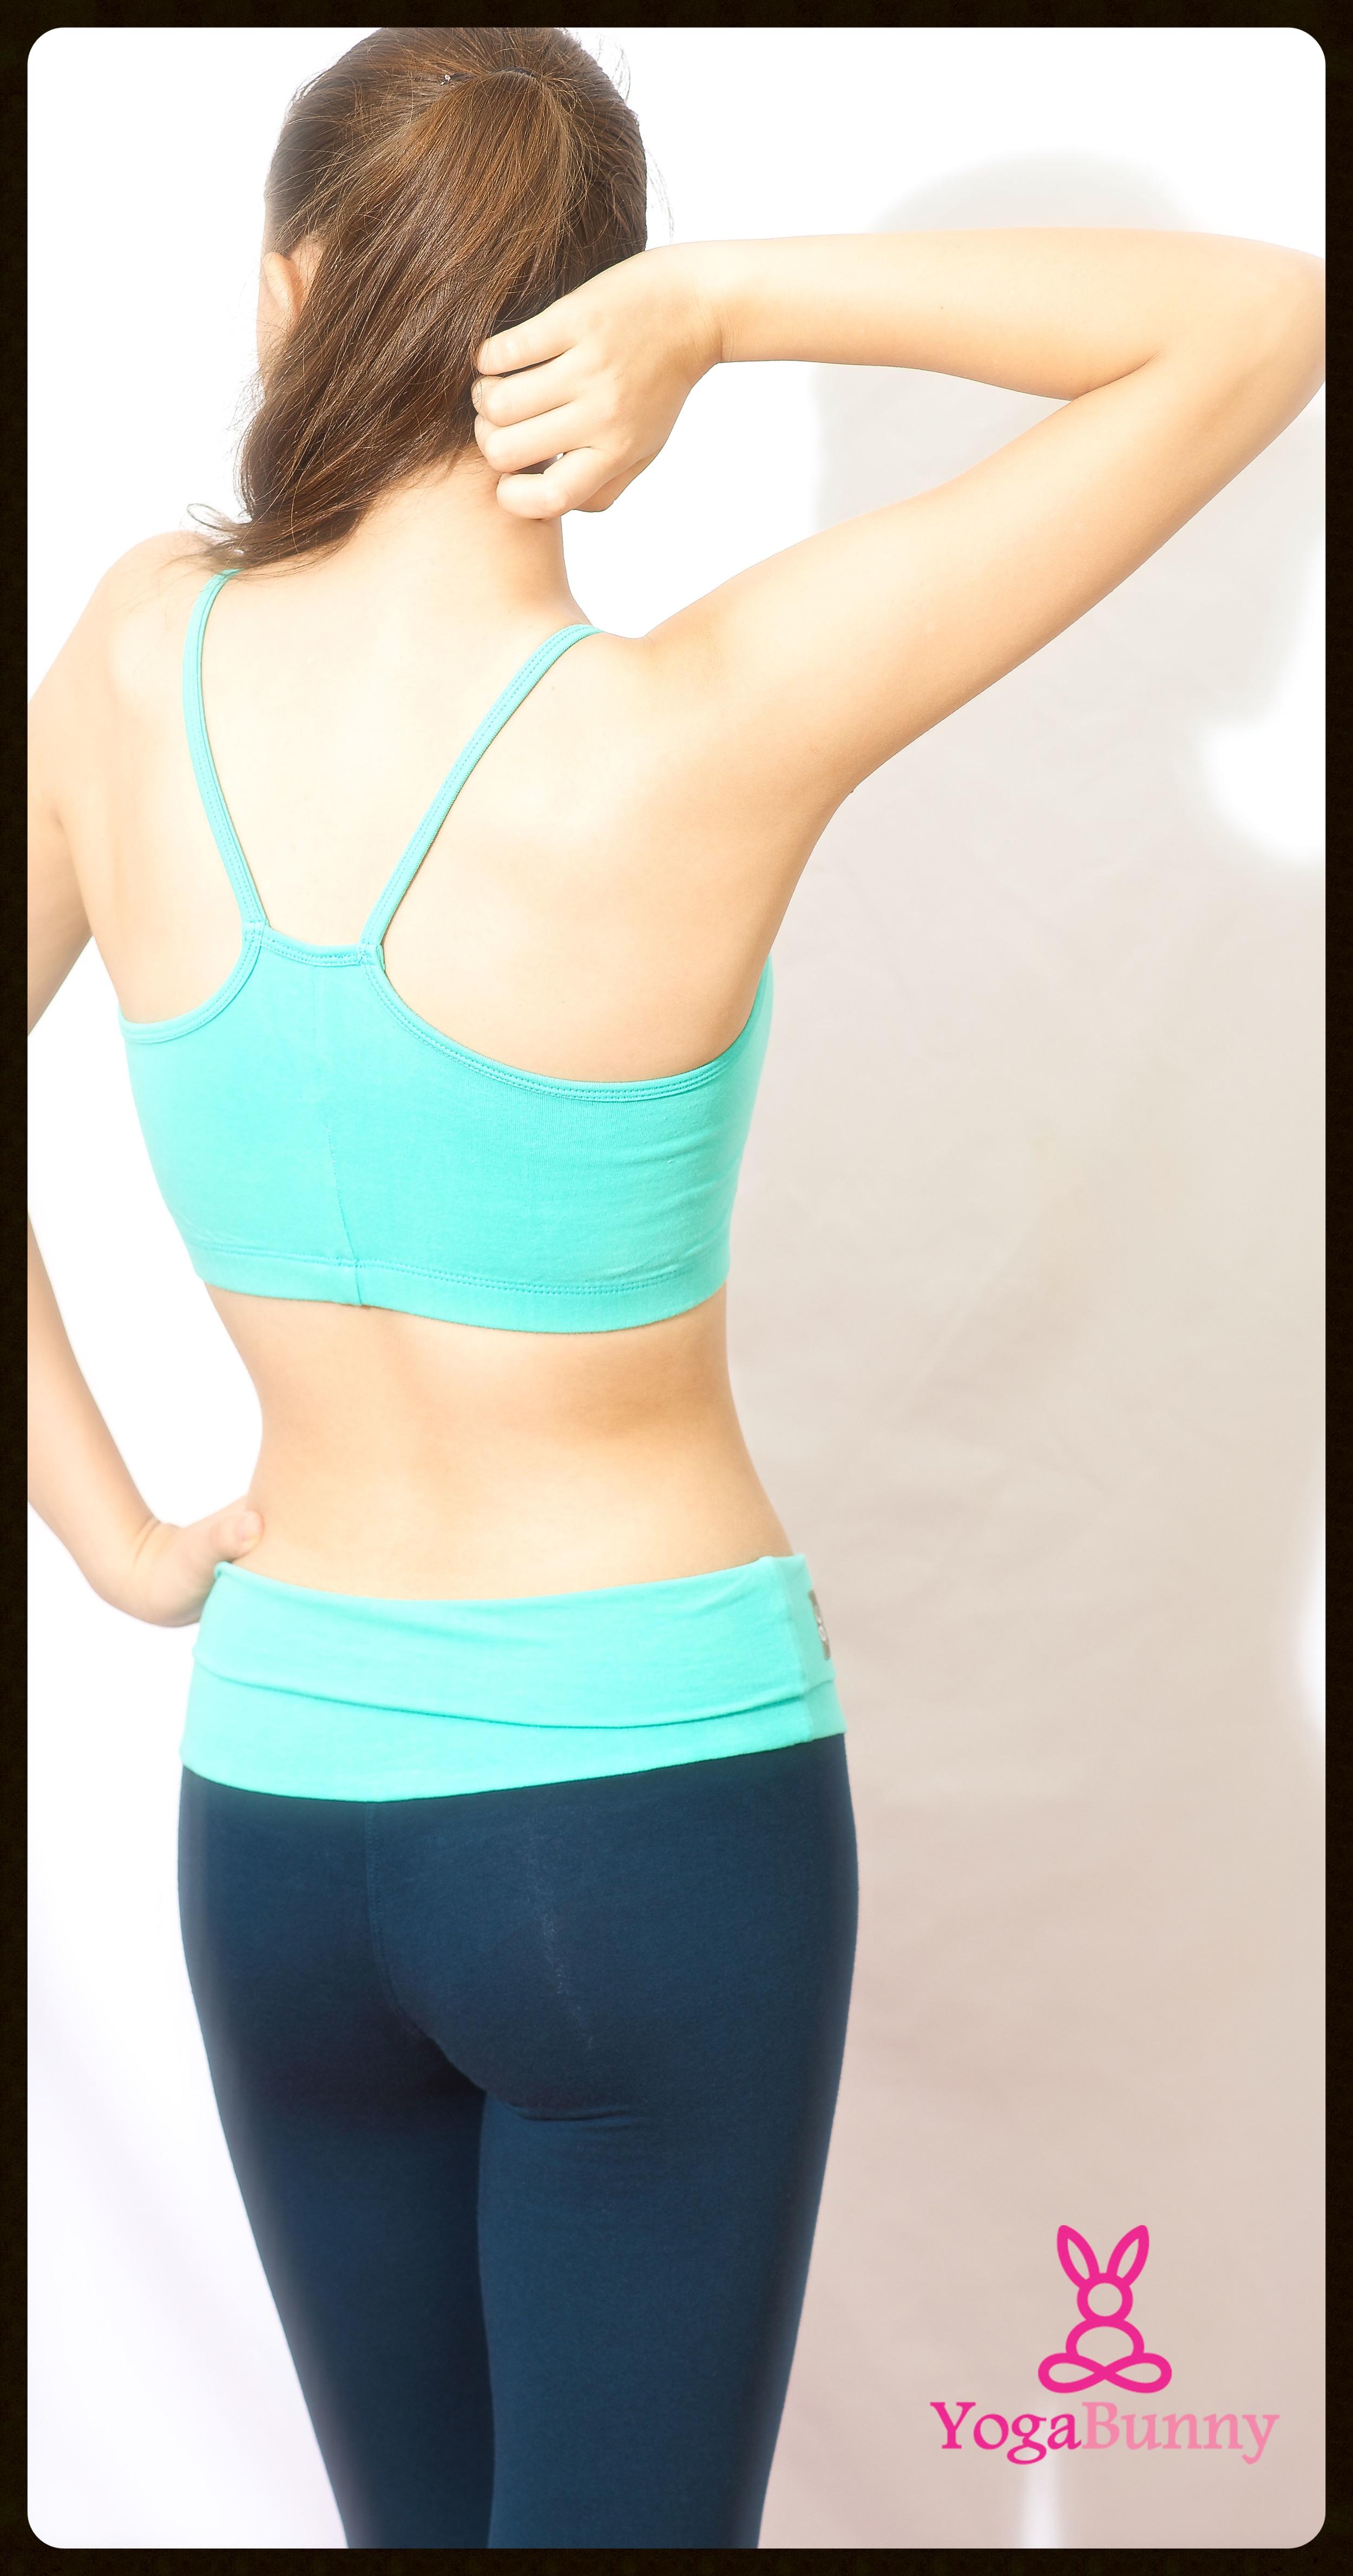 YogaBunny(Final)-14.jpg